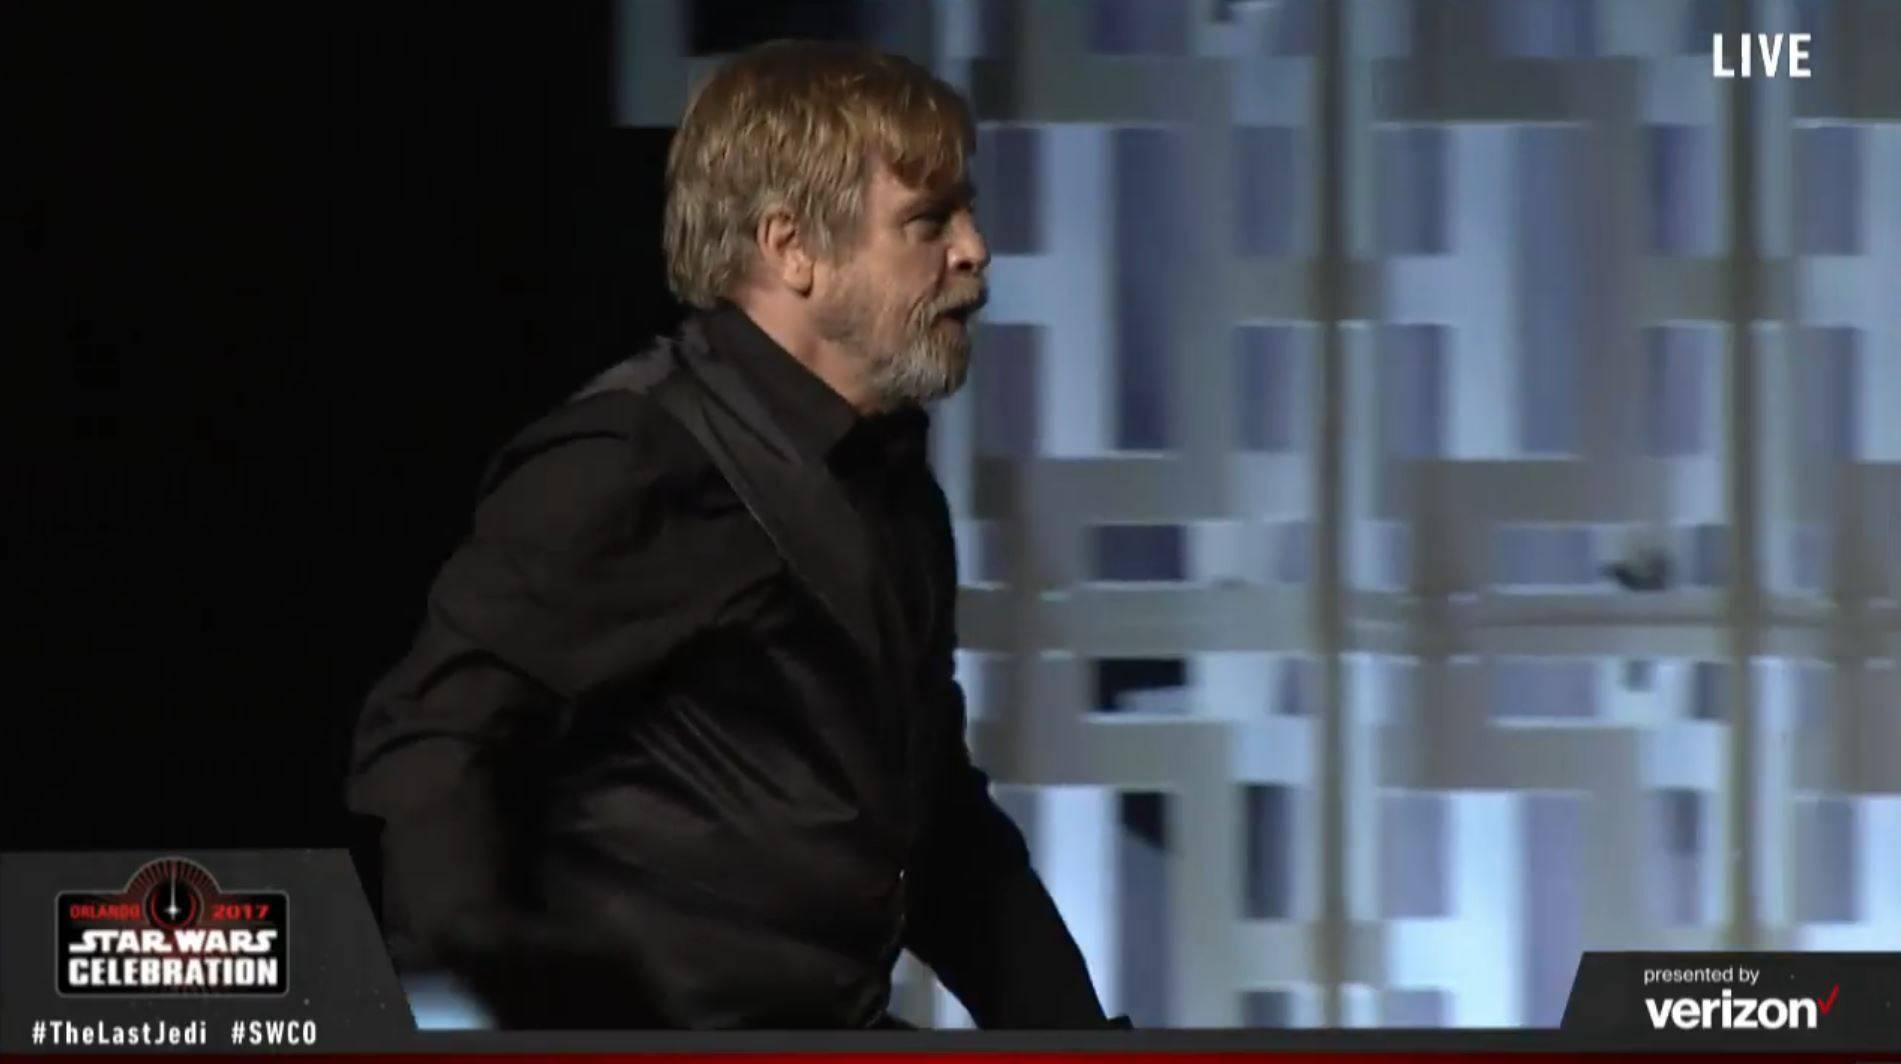 Как это было: презентация «Последние джедаи» на фестивале Star Wars Celebration 11